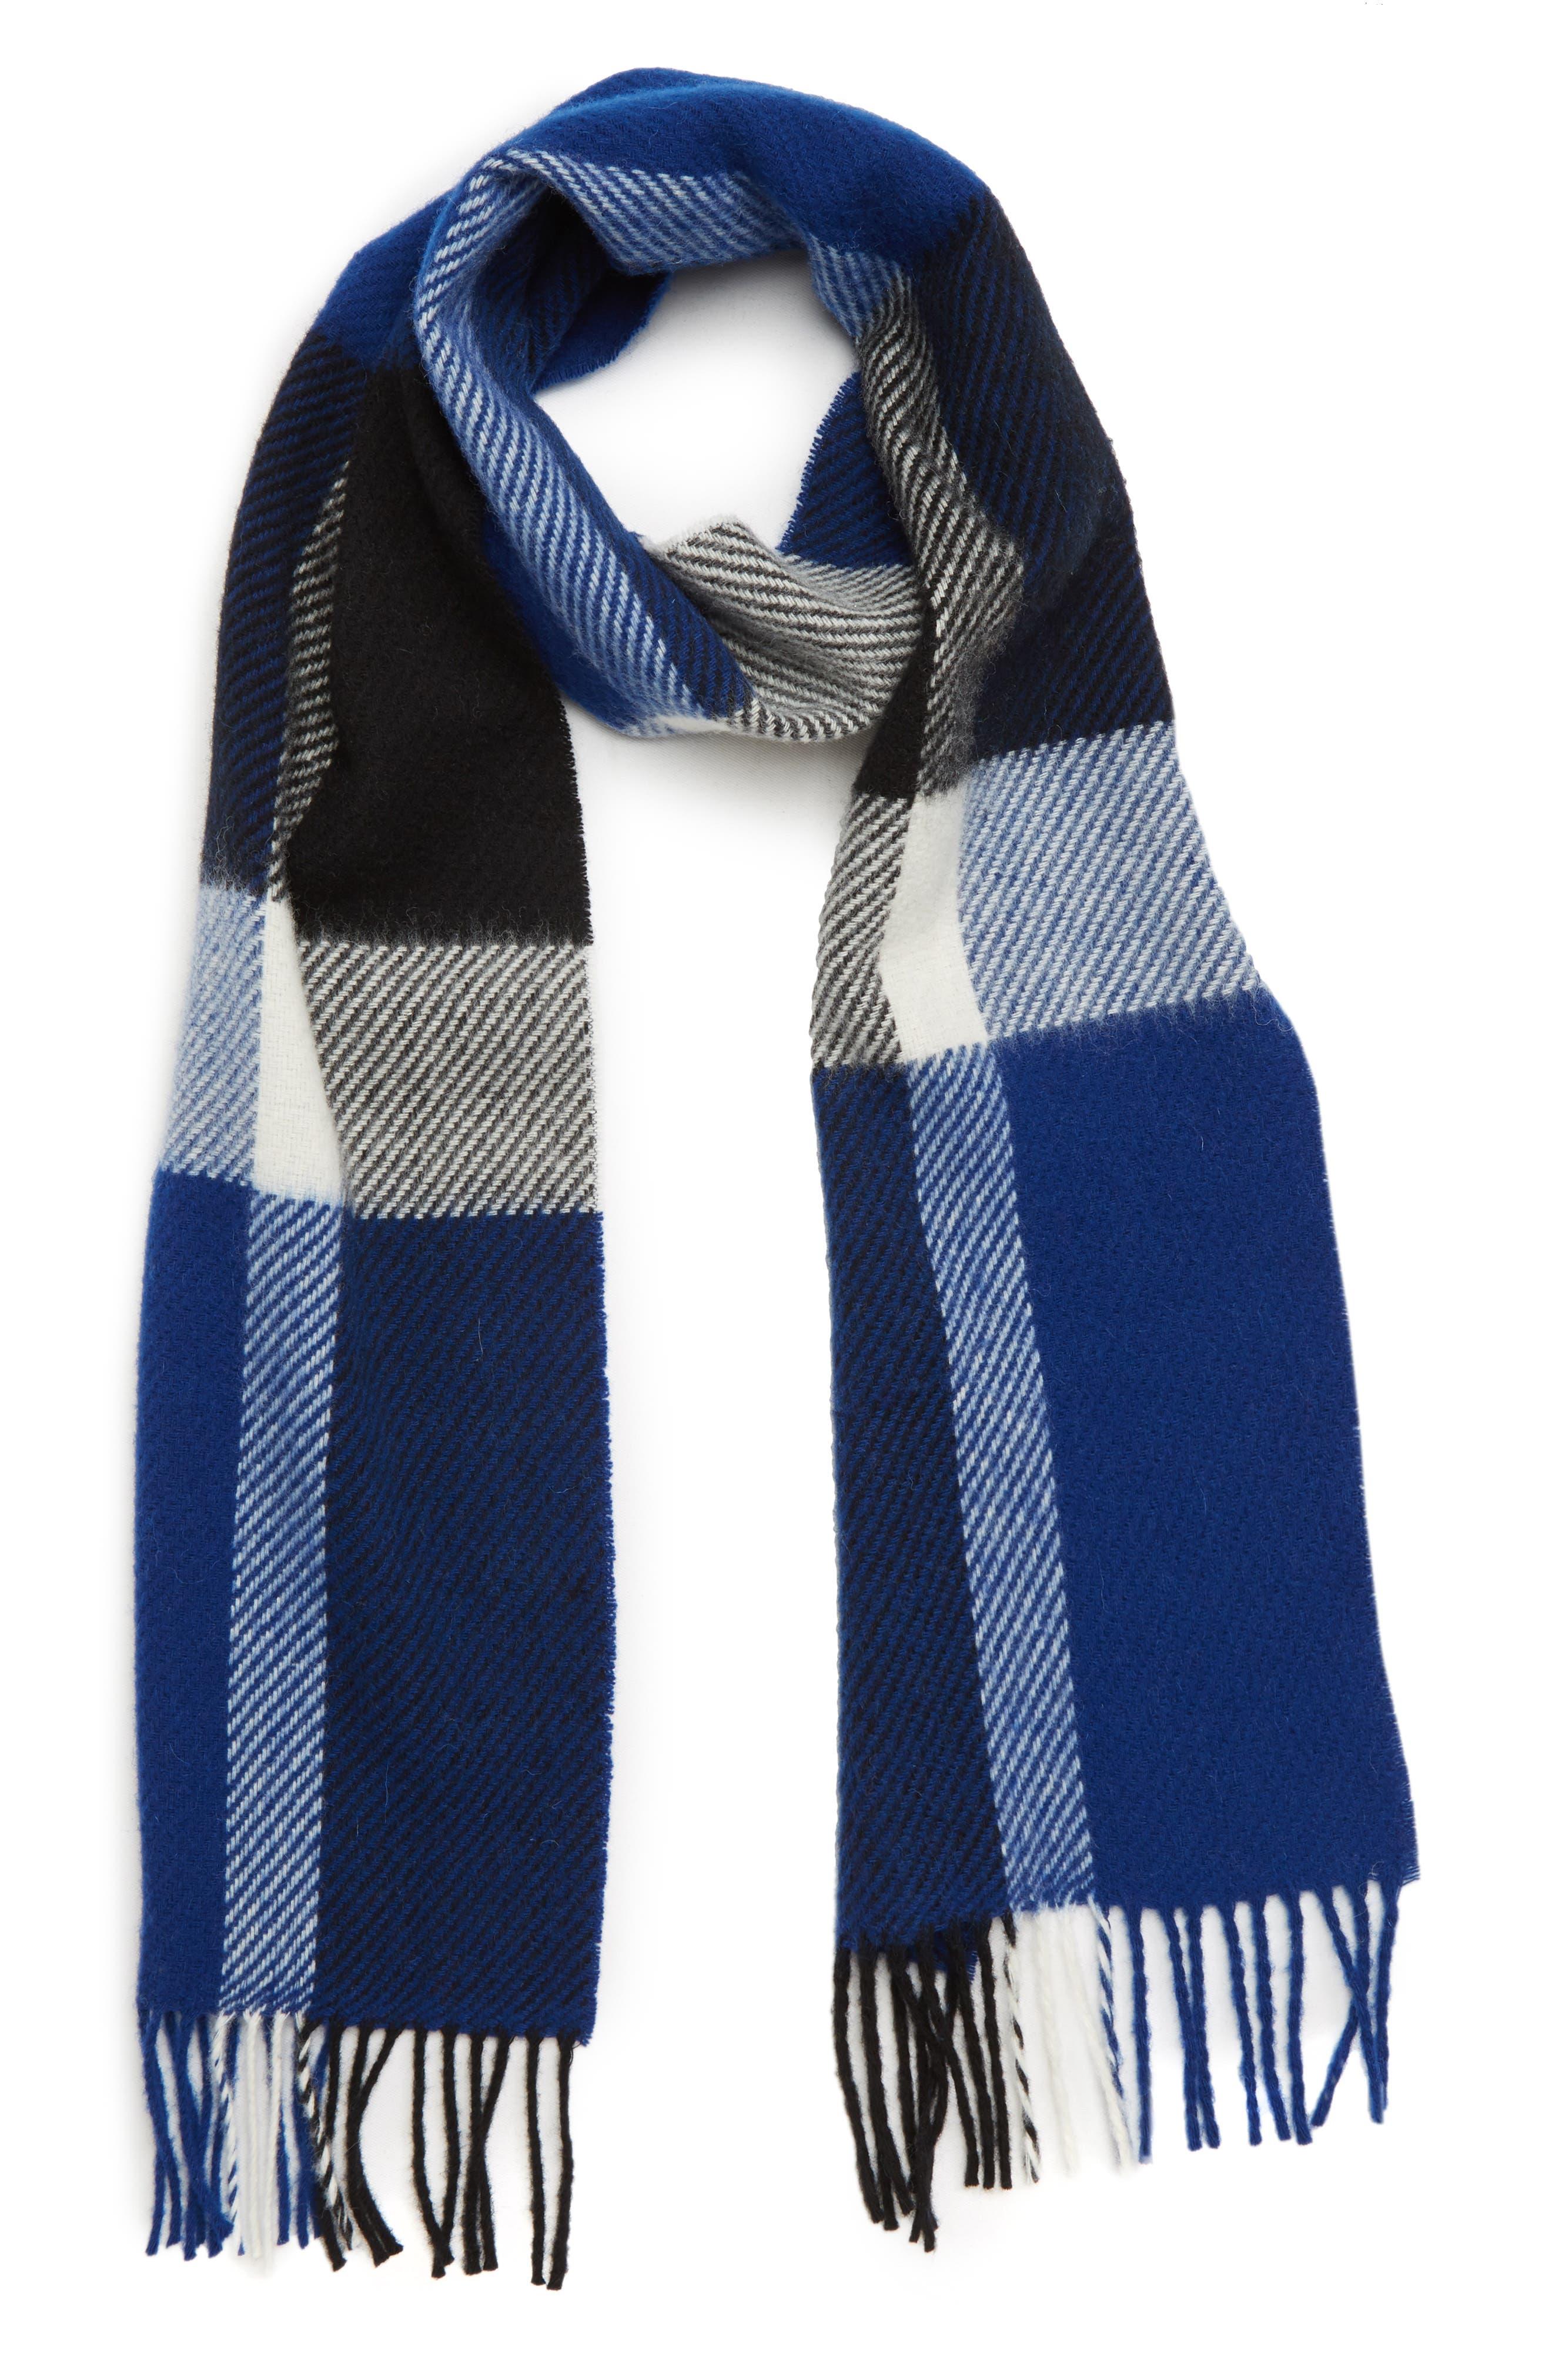 Oakwell Wool Scarf,                             Main thumbnail 1, color,                             BLUE/ BLACK